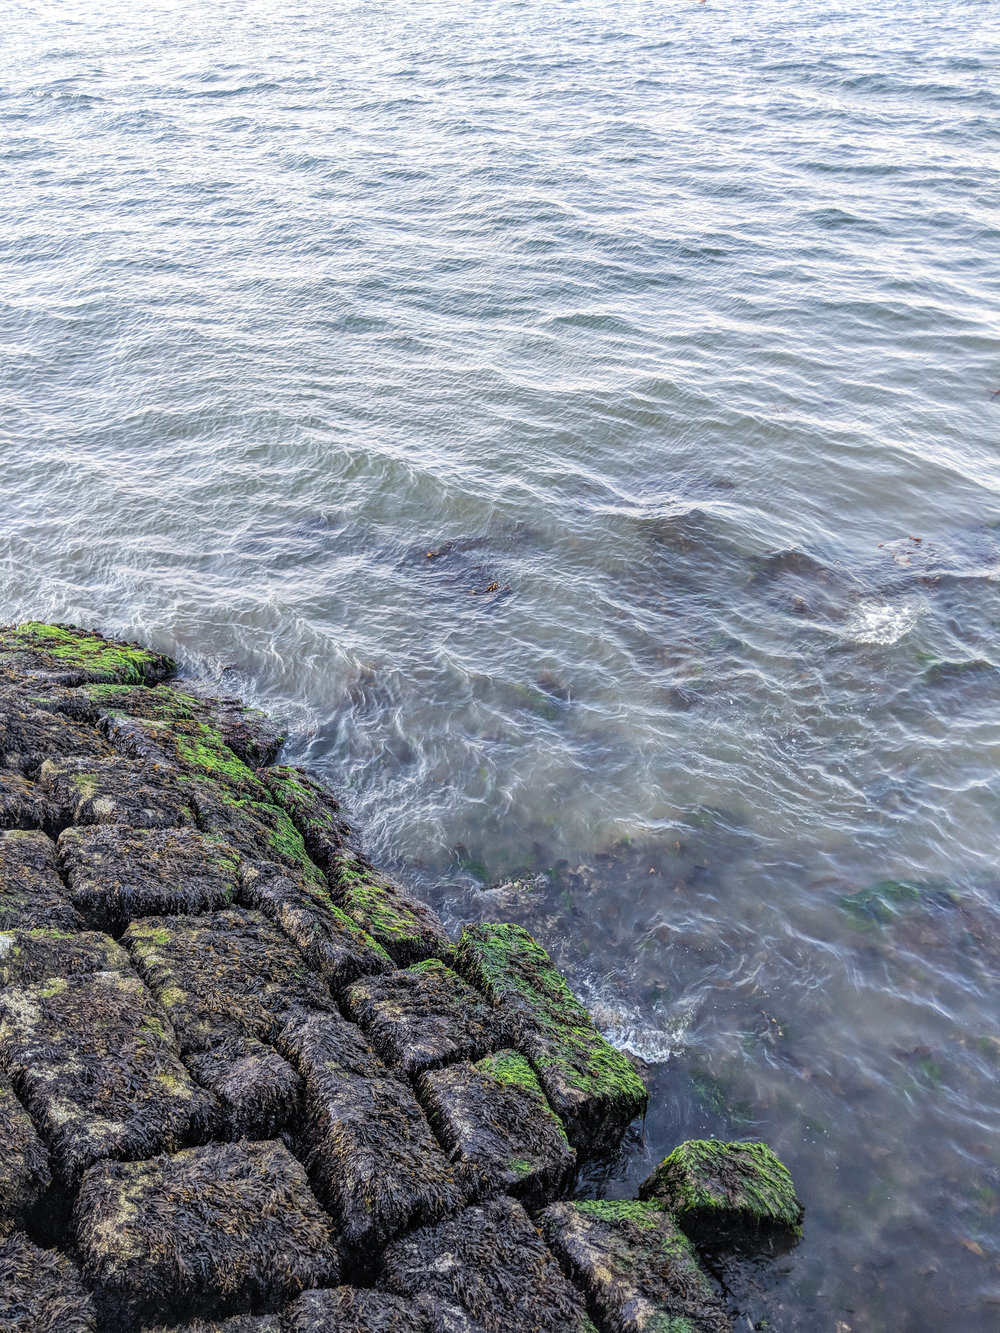 bri rinehart; ocean; photography